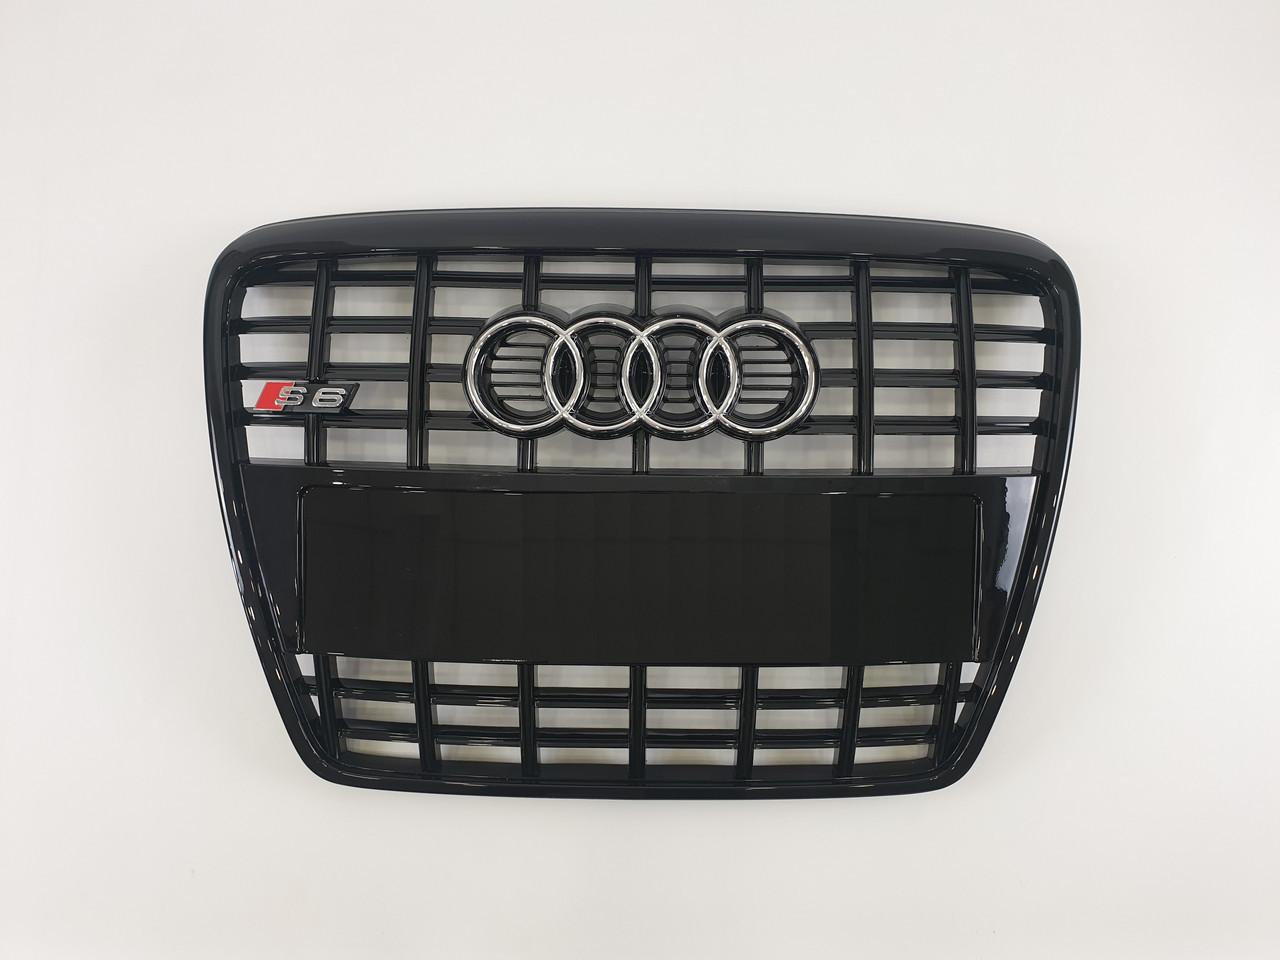 Решетка радиатора Тайвань Audi A6 C6 S6 04-11г С6 (hub_YtKw58495)